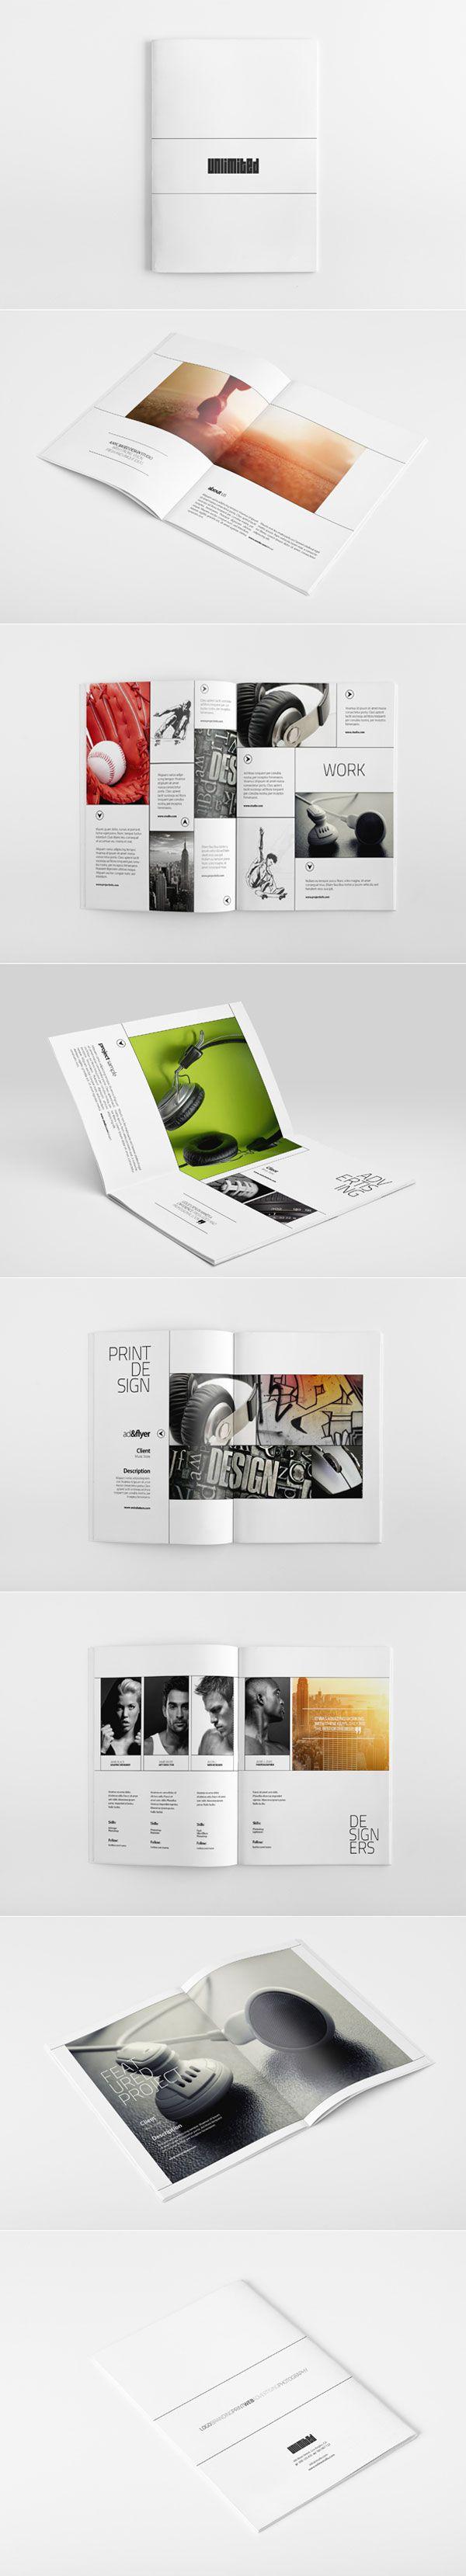 Portfolio brochure design ideas 20+ Simple Yet Beautiful Brochure ...